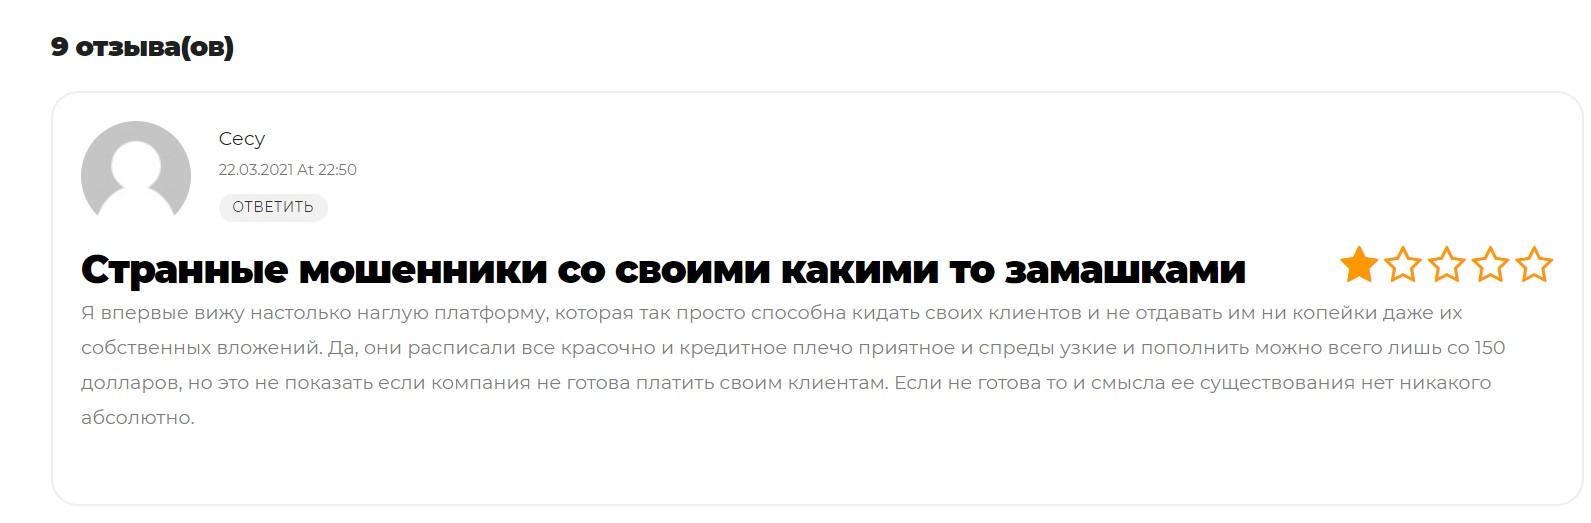 specteh.com комментарии